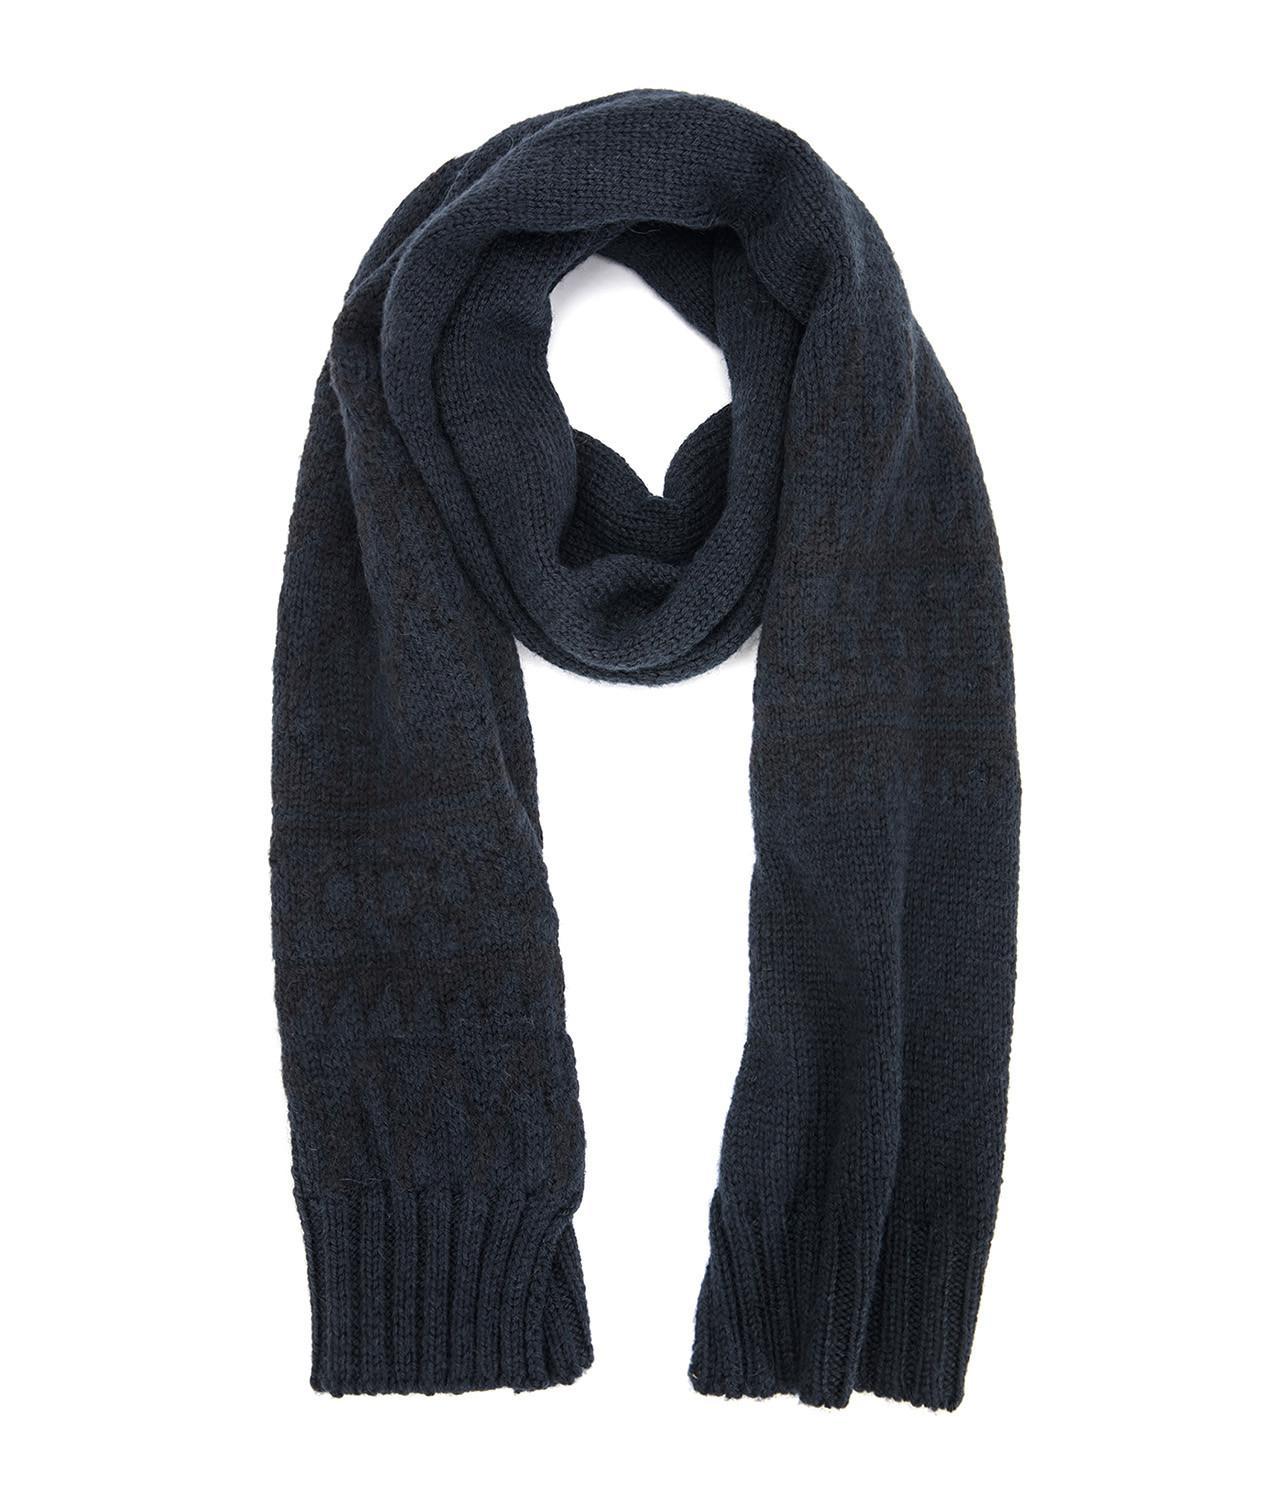 ACCESSORIES - Oblong scarves Dries Van Noten f3d4mR